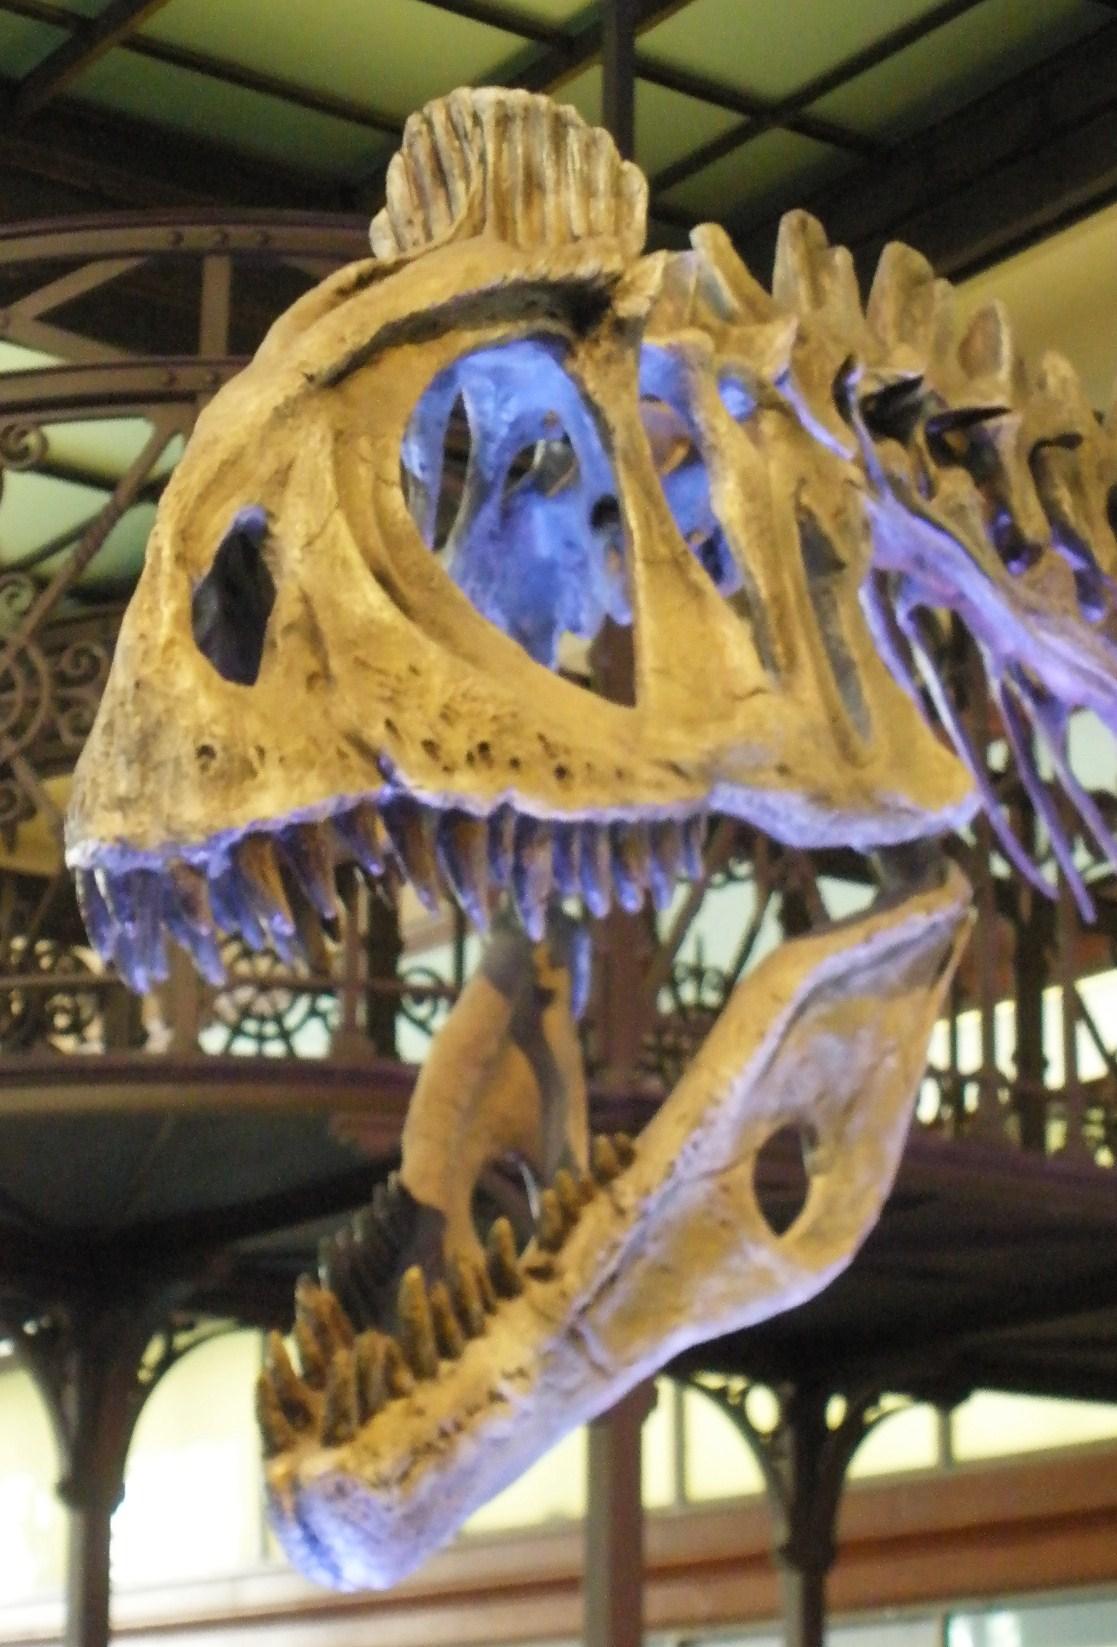 Cryolophosaurus ellioti by Telera1701 on DeviantArt